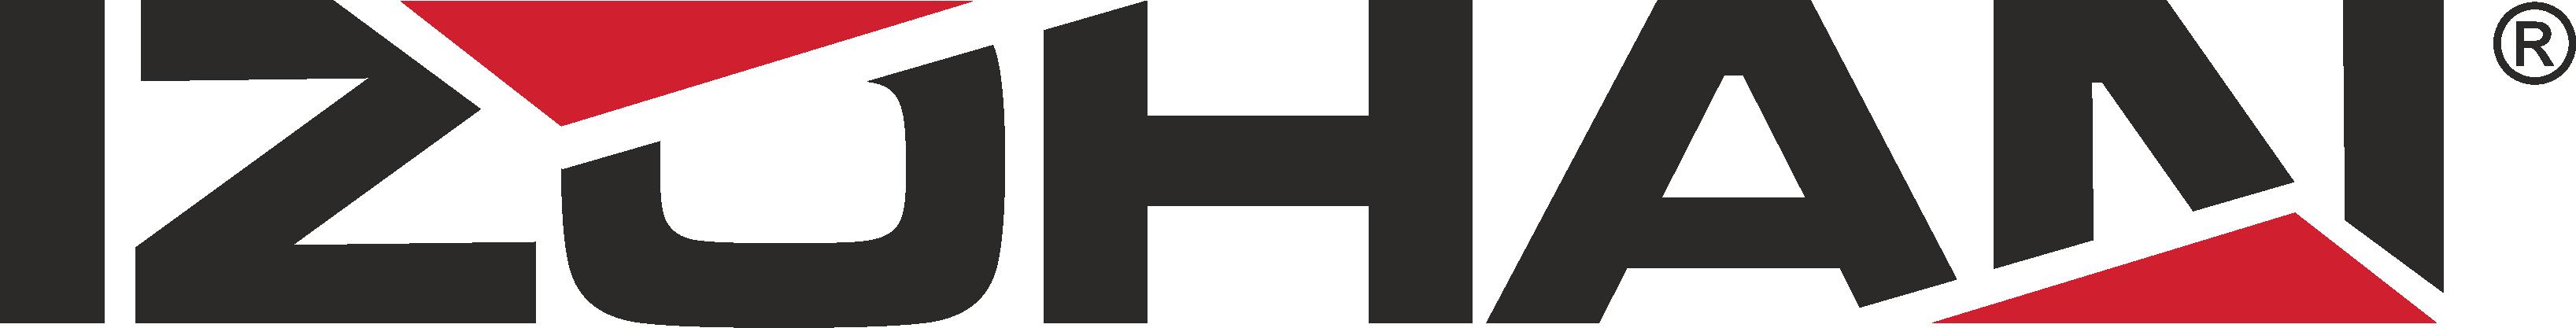 https://izohan.EU/wp-content/uploads/2019/02/logo_nowe.png